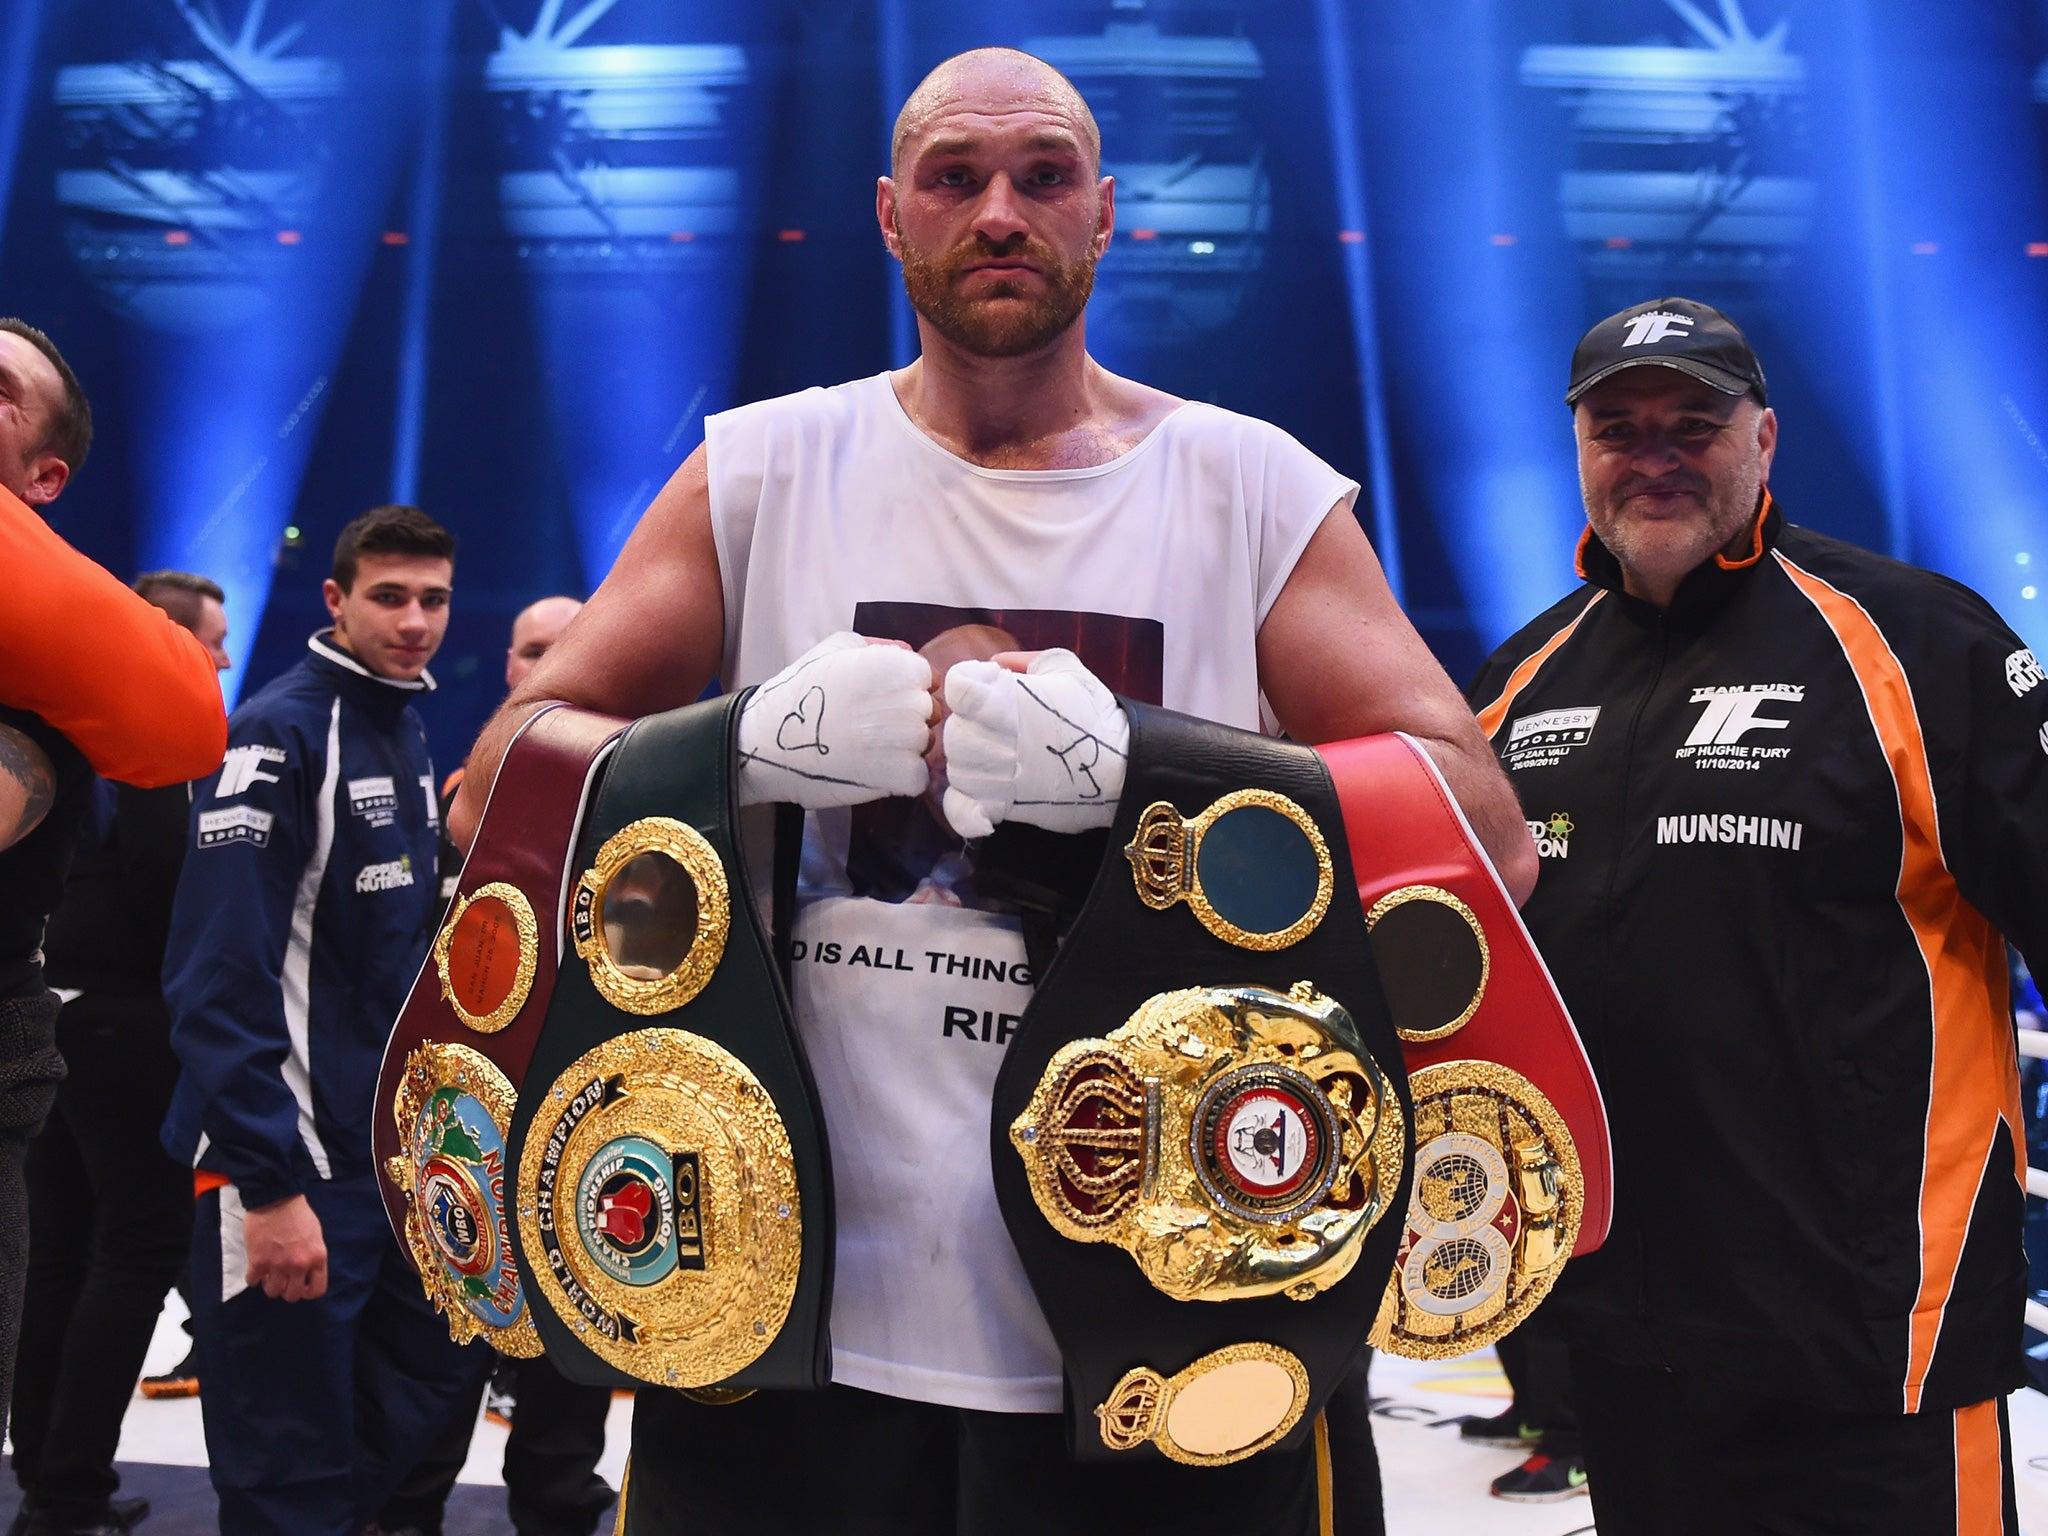 Tyson Fury lost his IBF champion title 09.12.2015 26